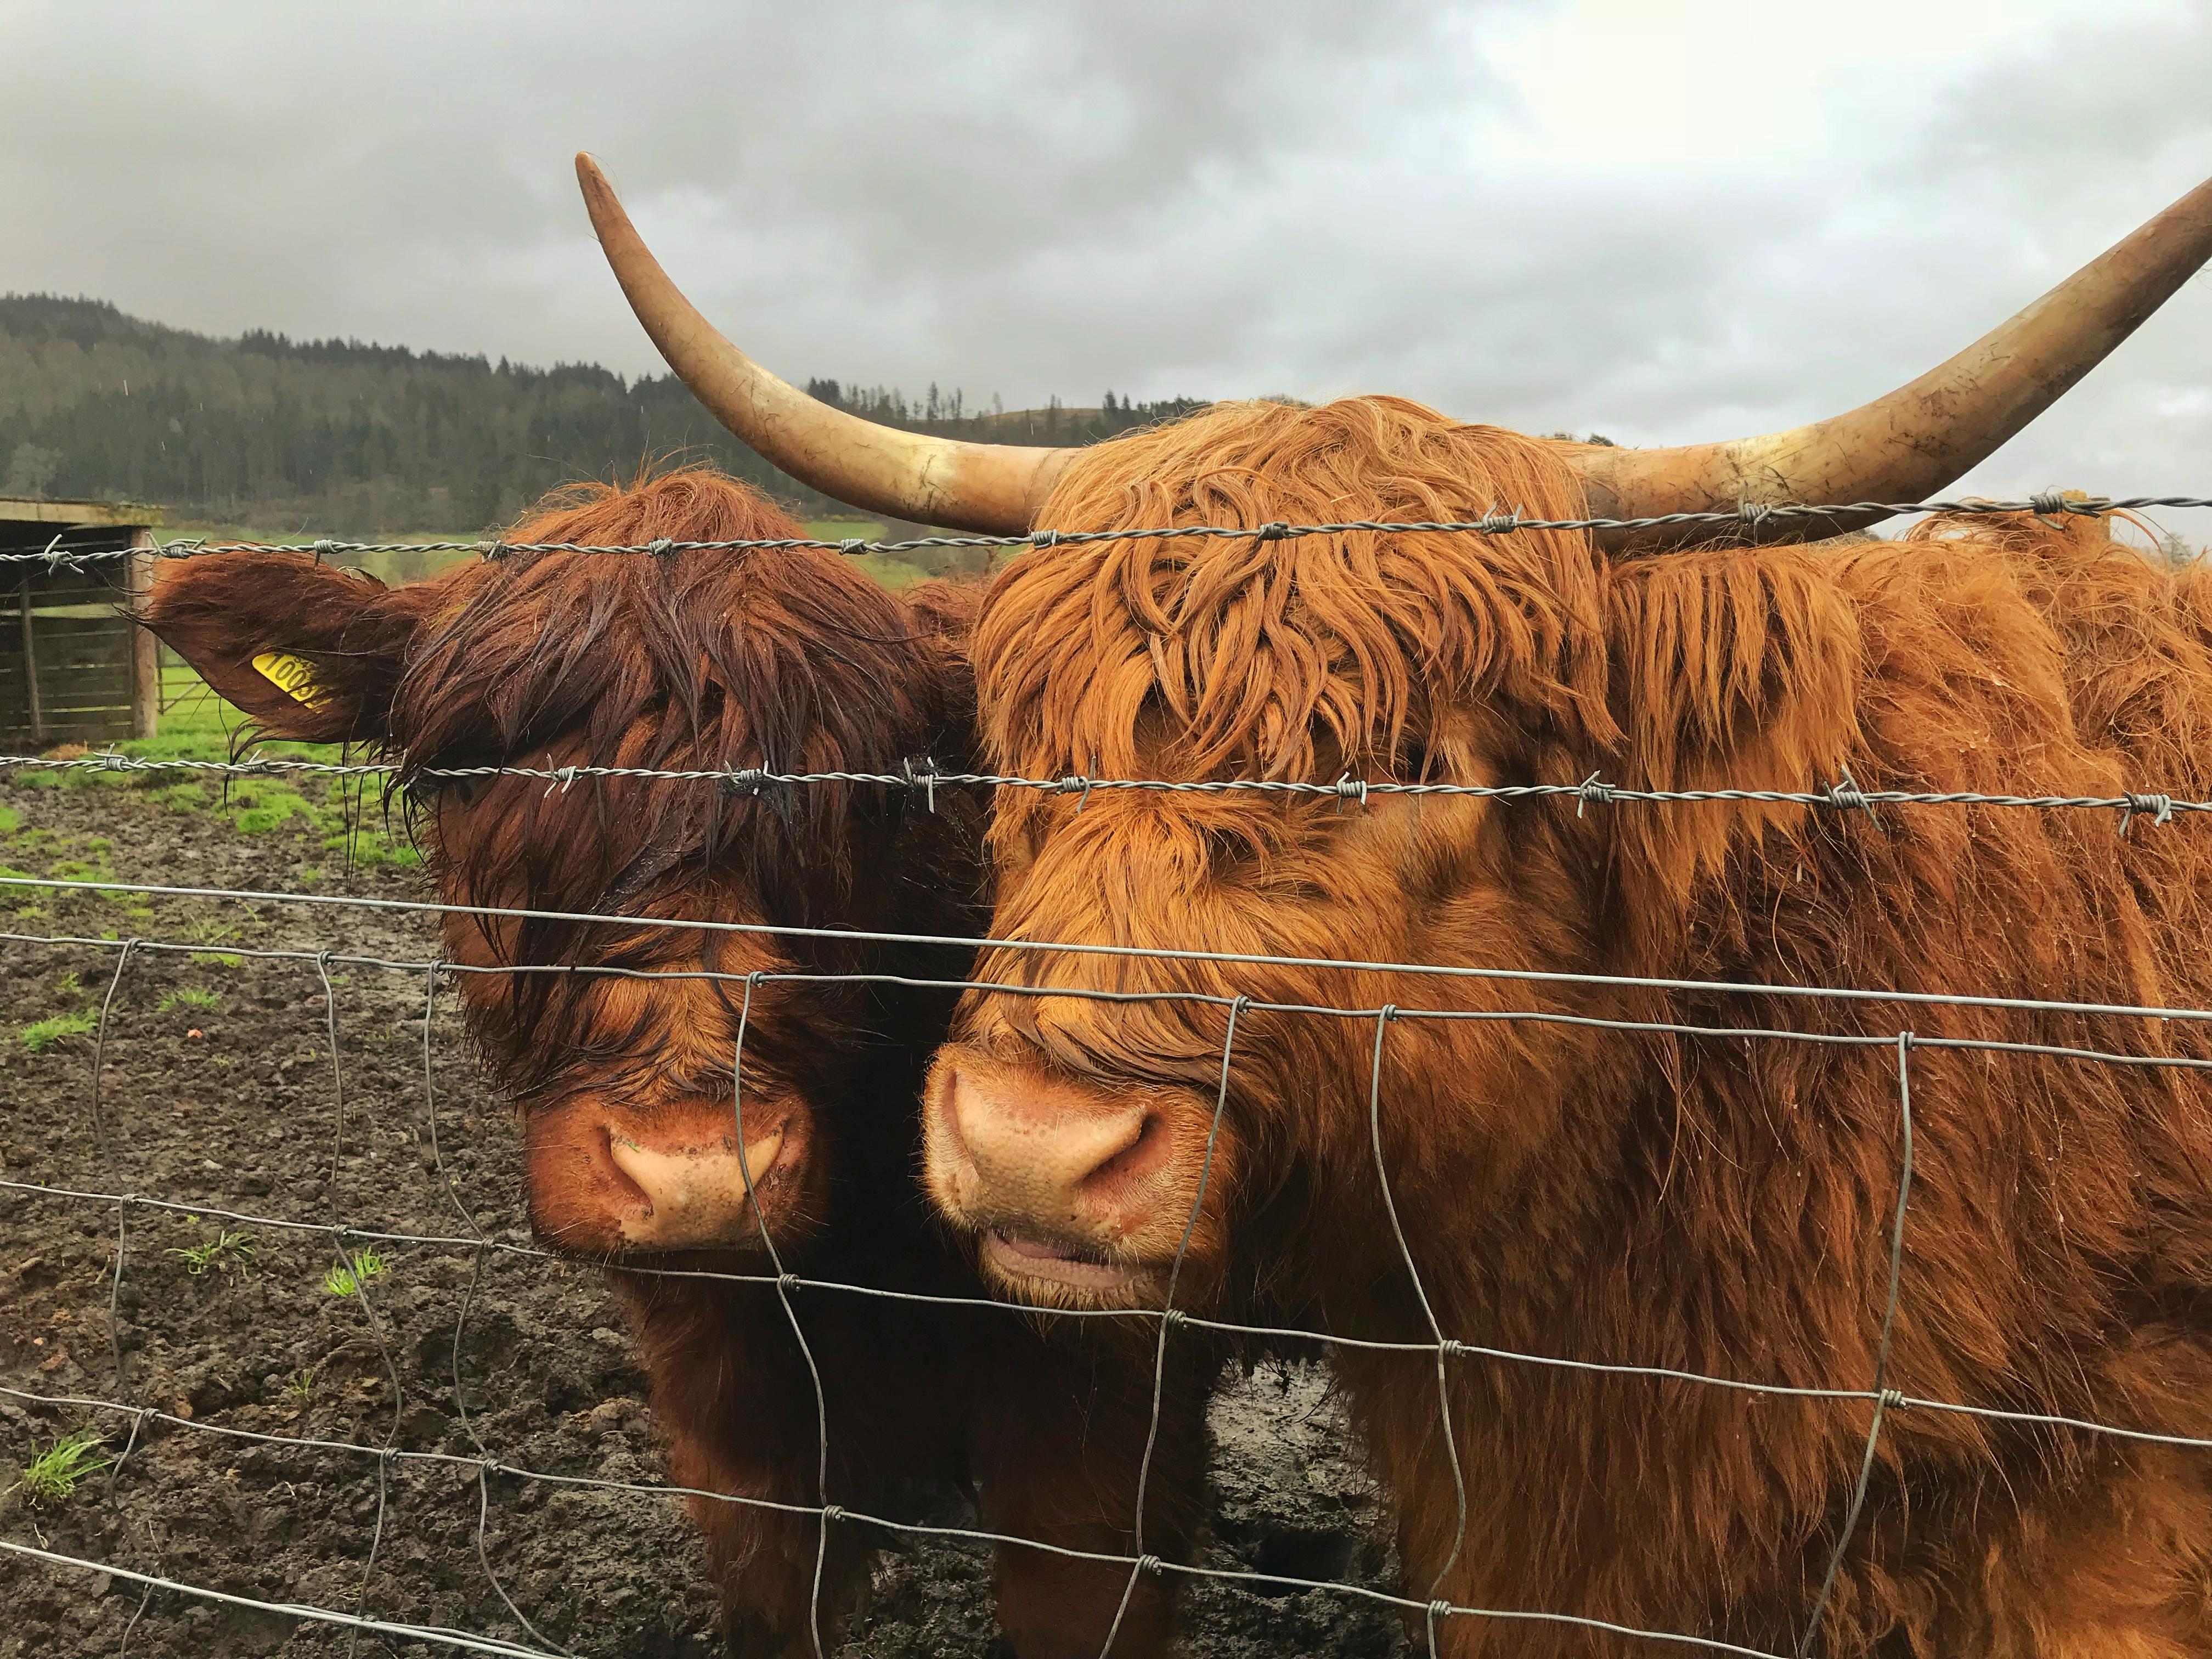 incontri scozzesi doganali